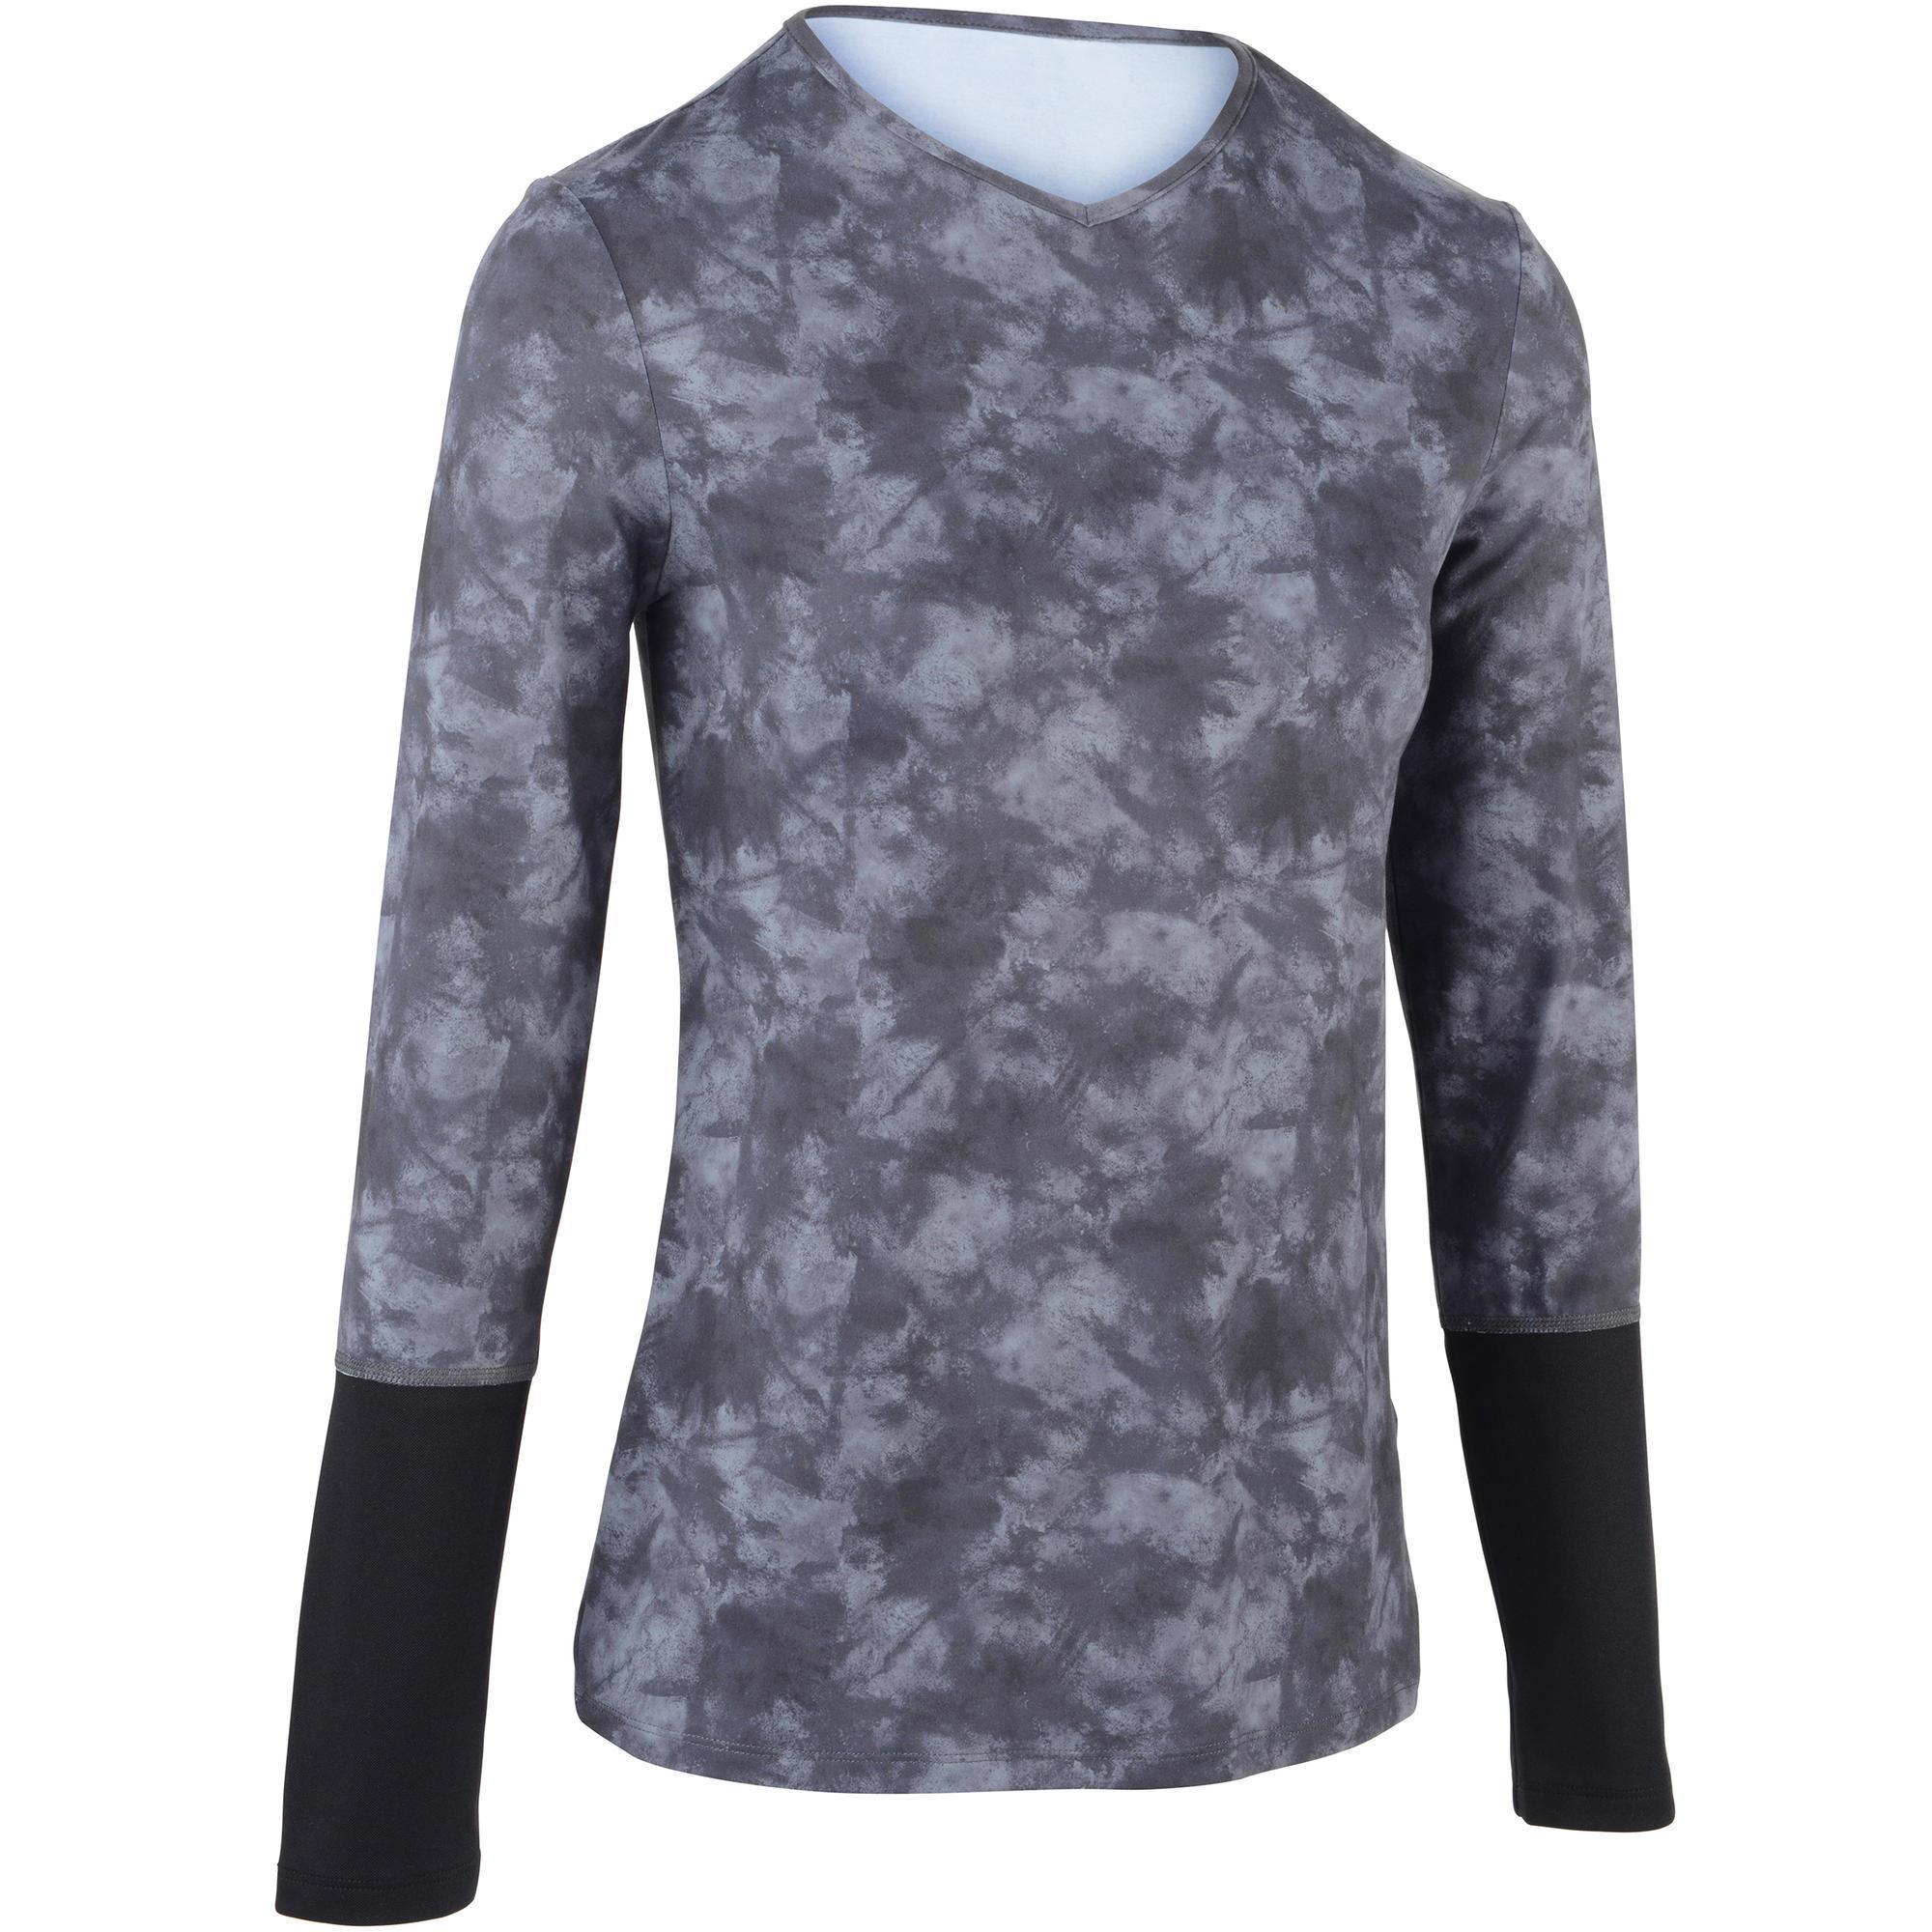 Essential Women s Tennis T-Shirt - Graphic Black  73f432b5c